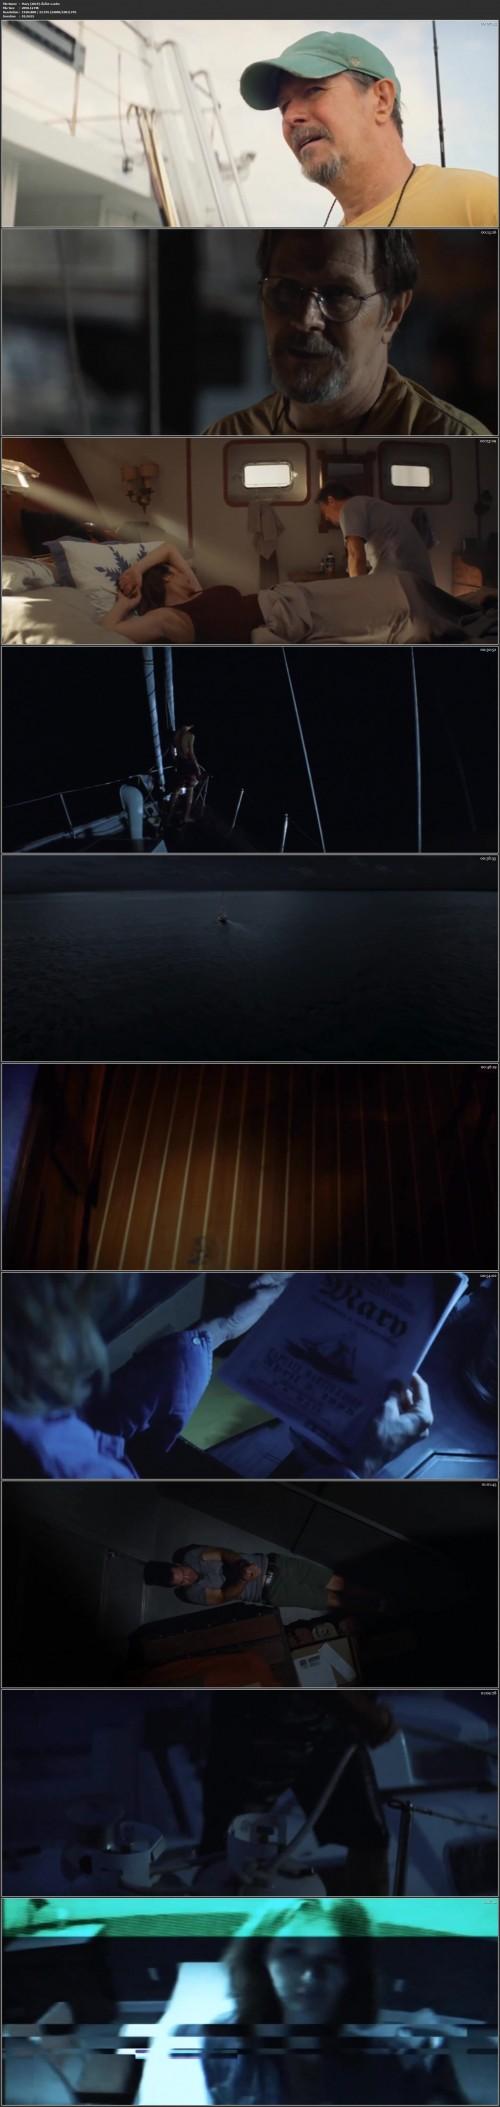 Mary (2019) เรือปีศาจ.mkv